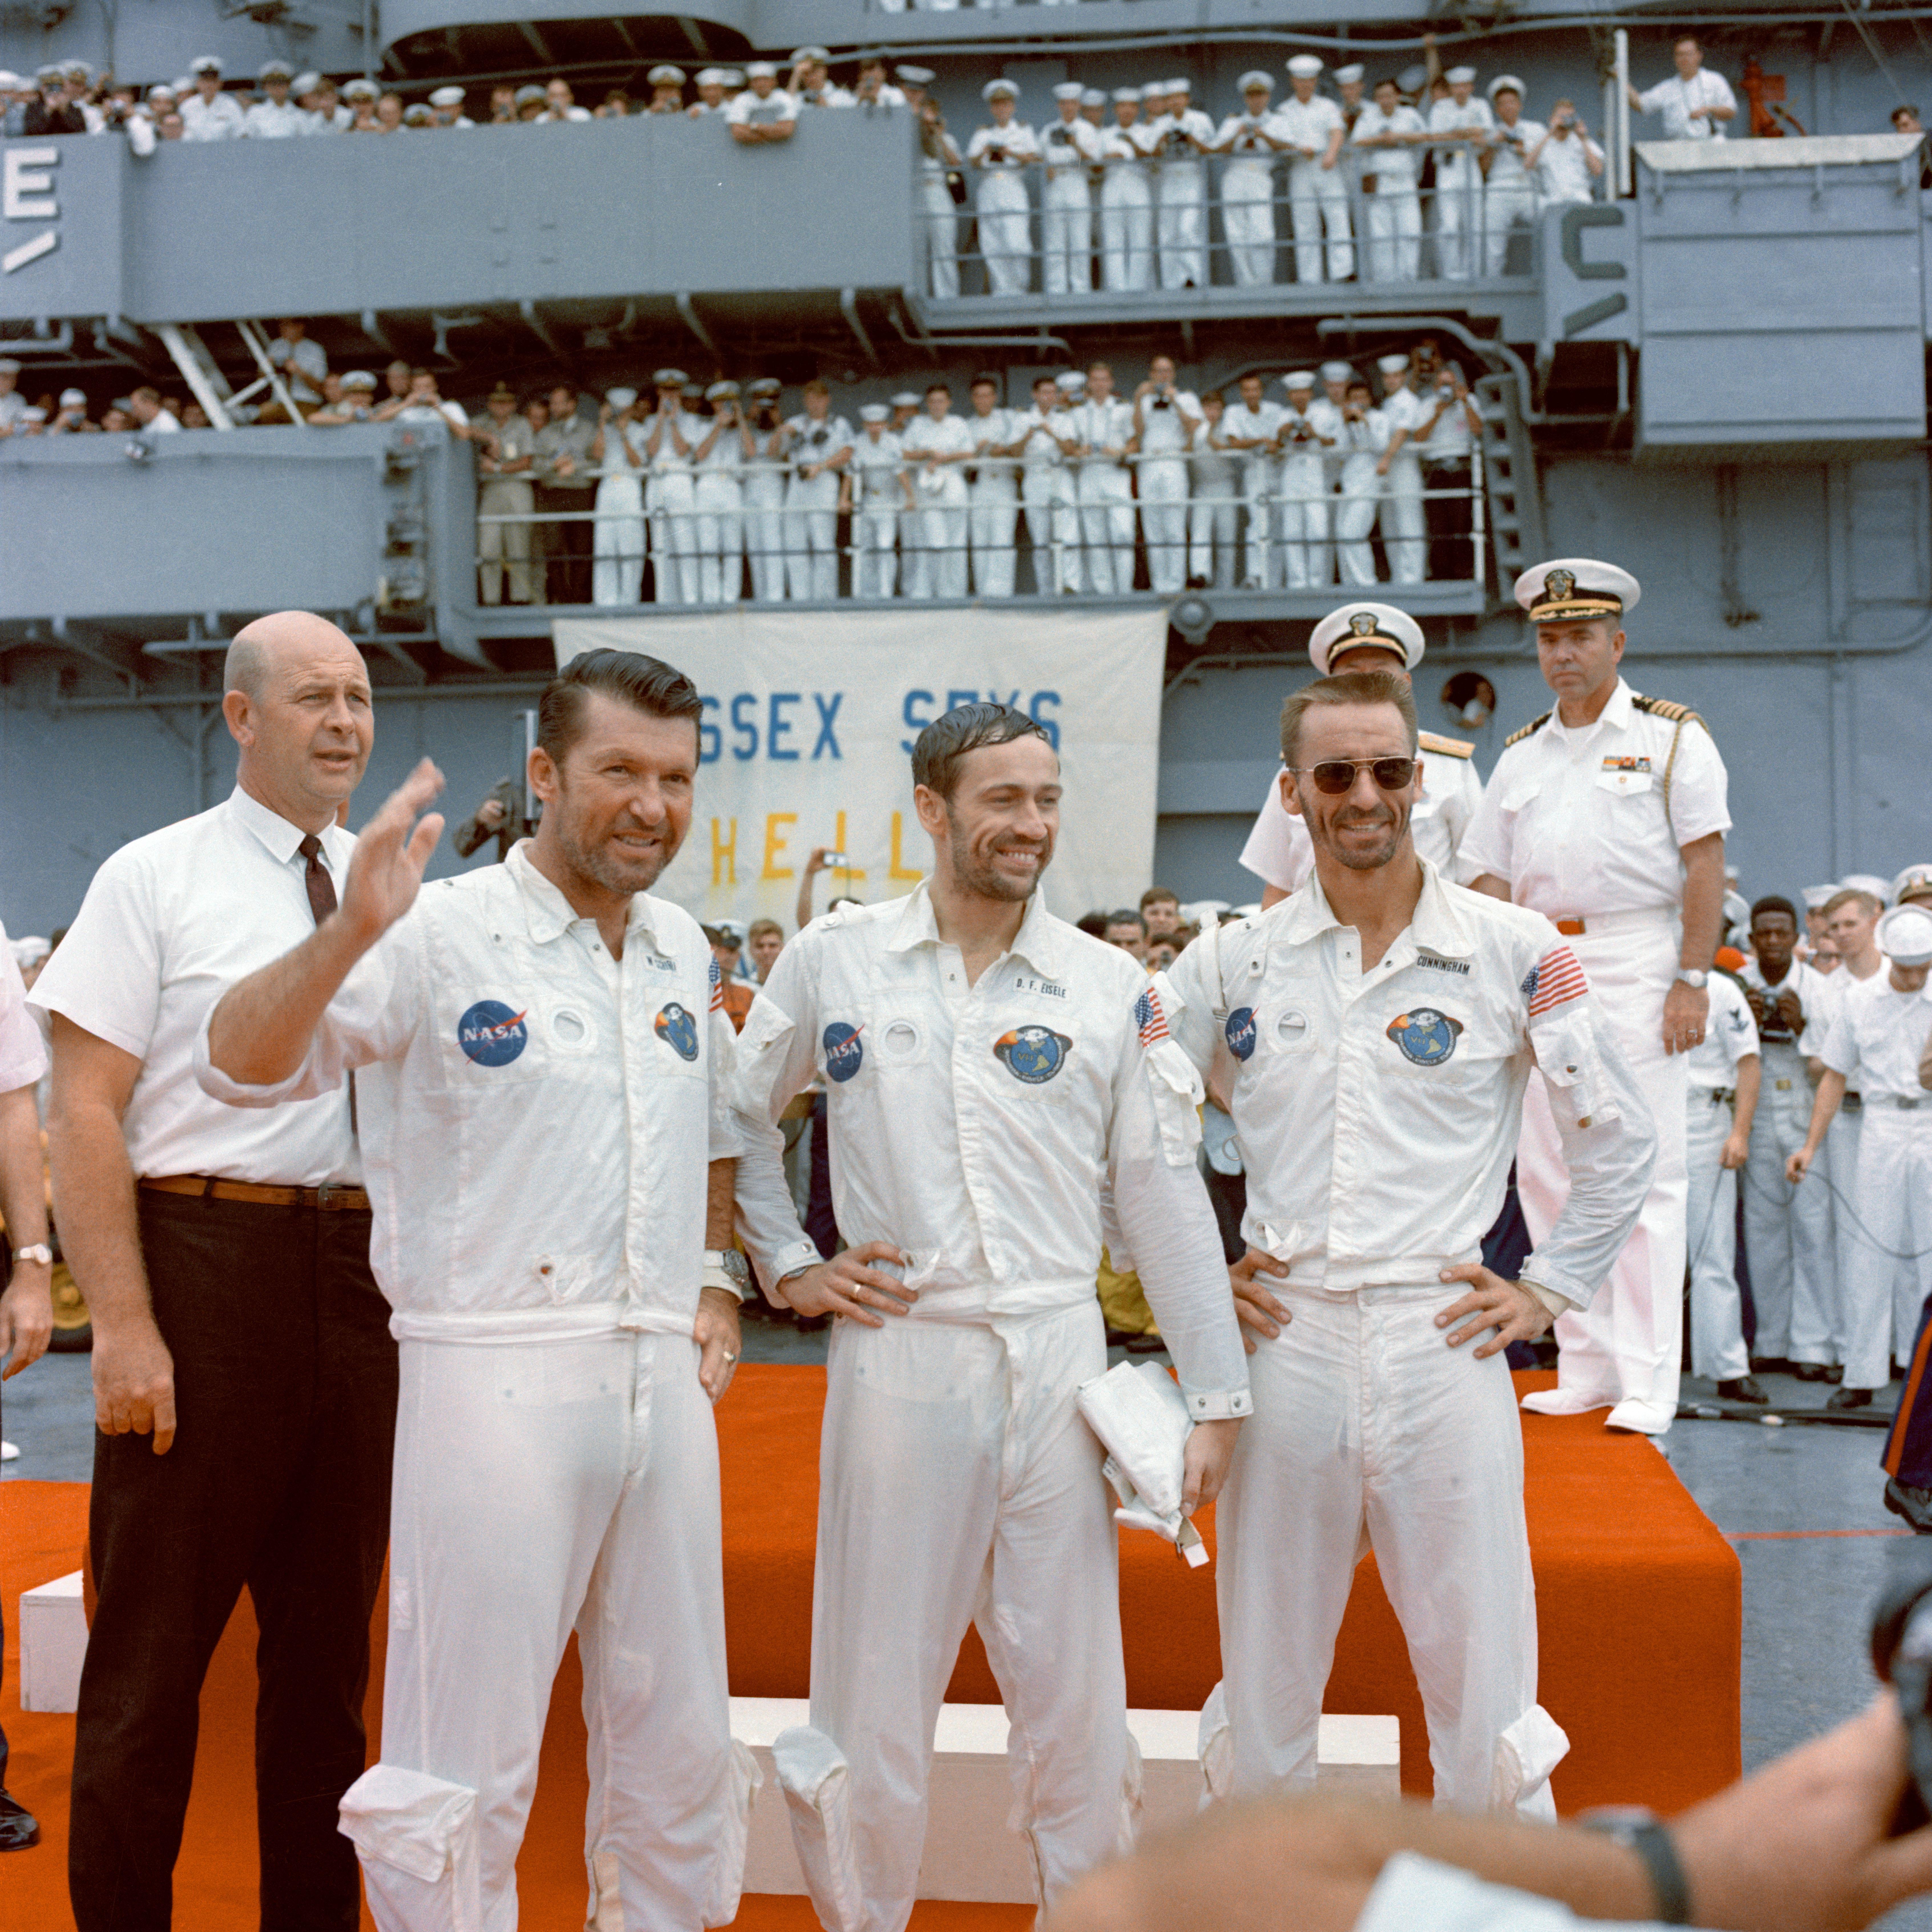 apollo space missions crews - photo #25